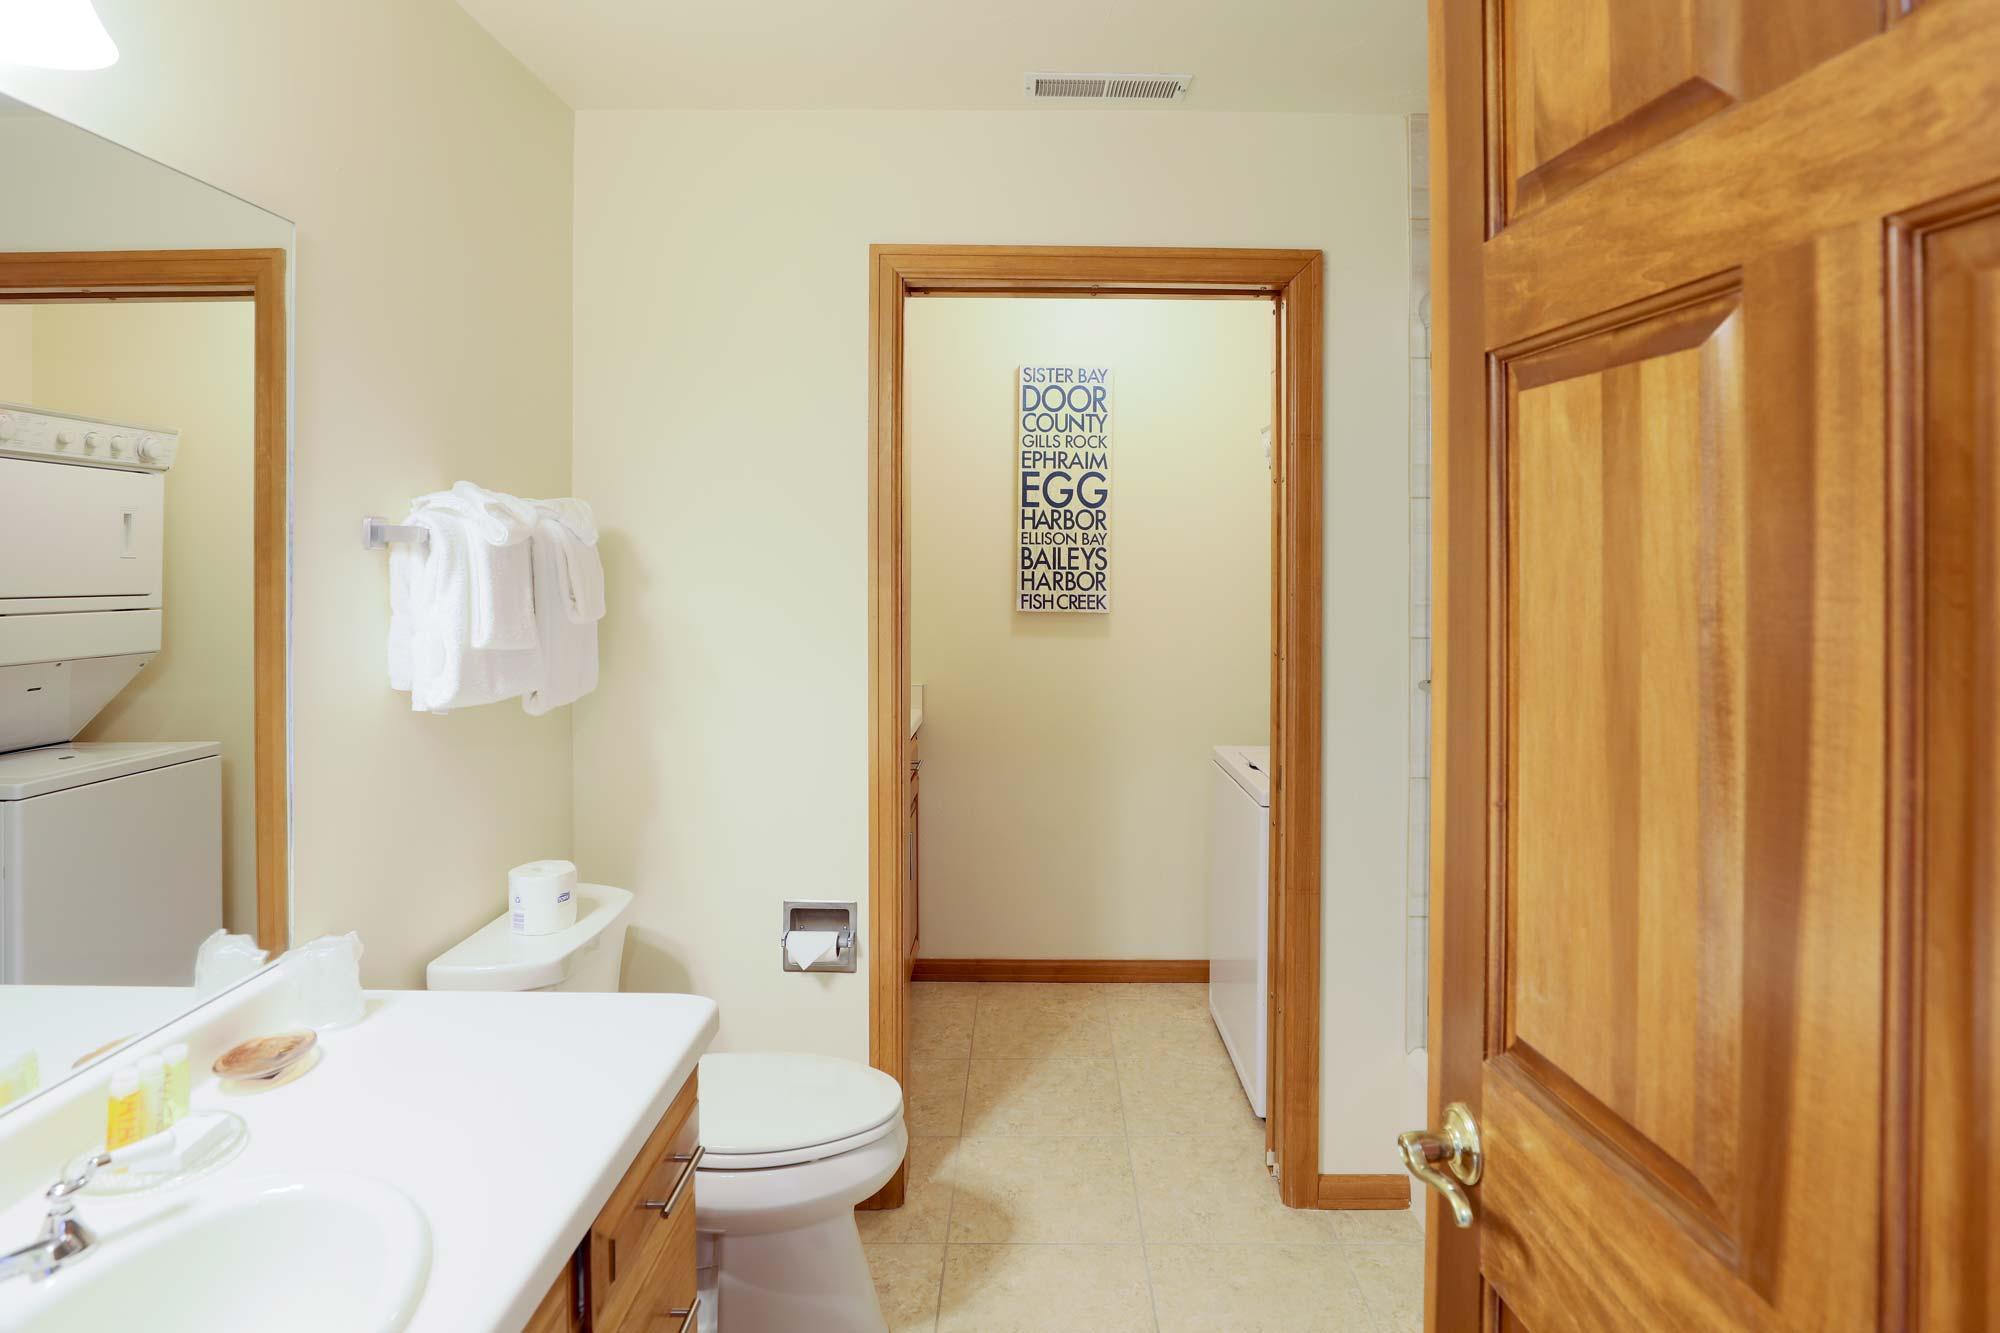 Bathroom of Luxury Three Bedroom Vacation Rental at Sturgeon Bay Resort